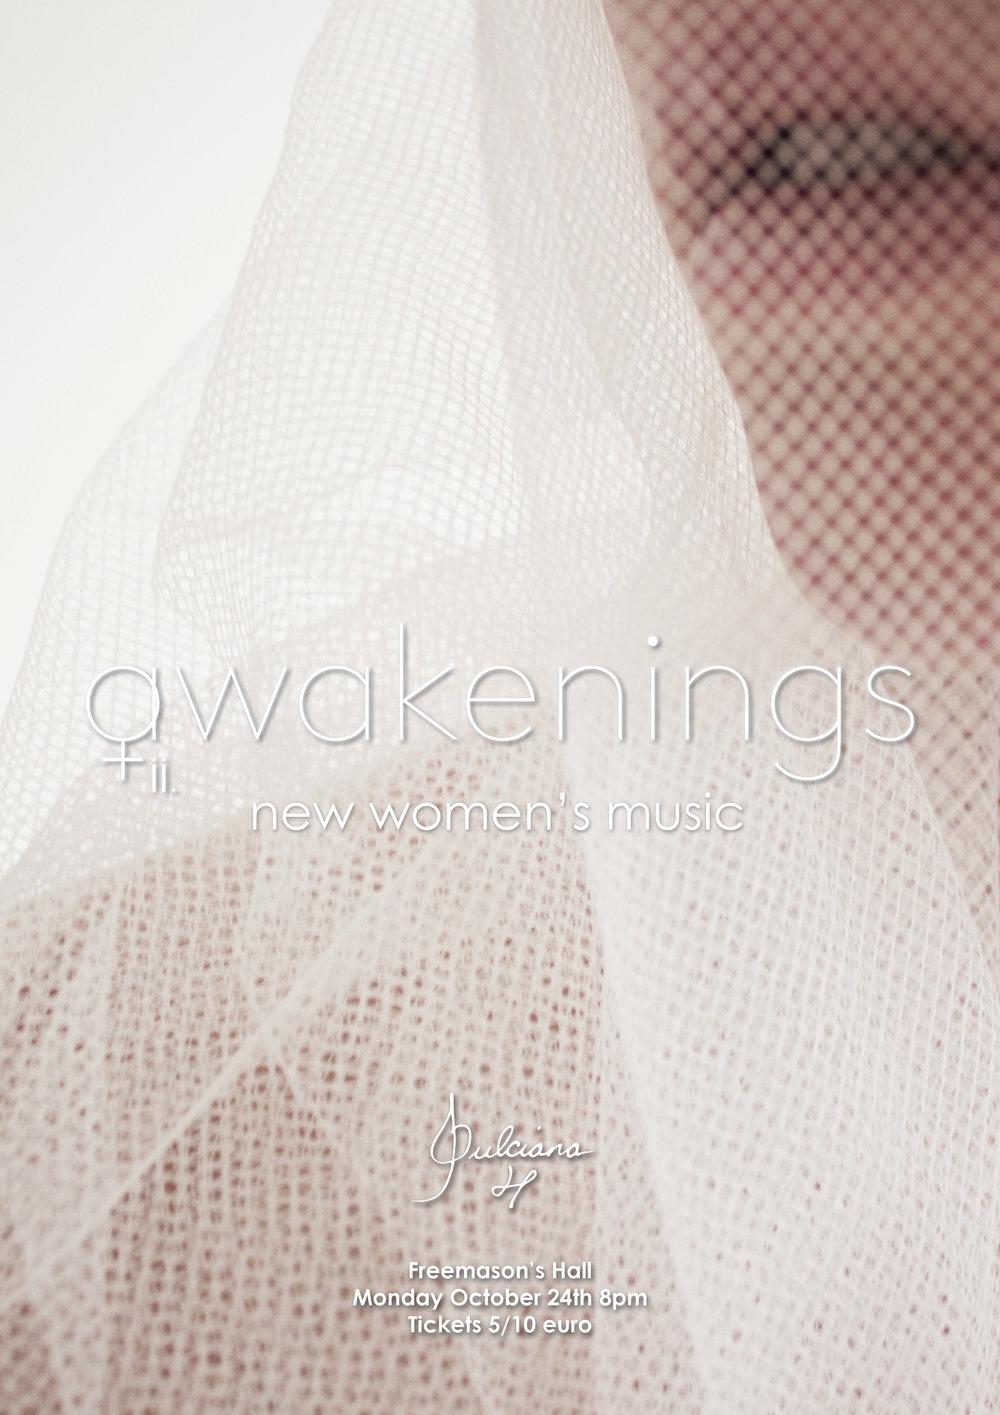 Awakenings A4_final.jpg